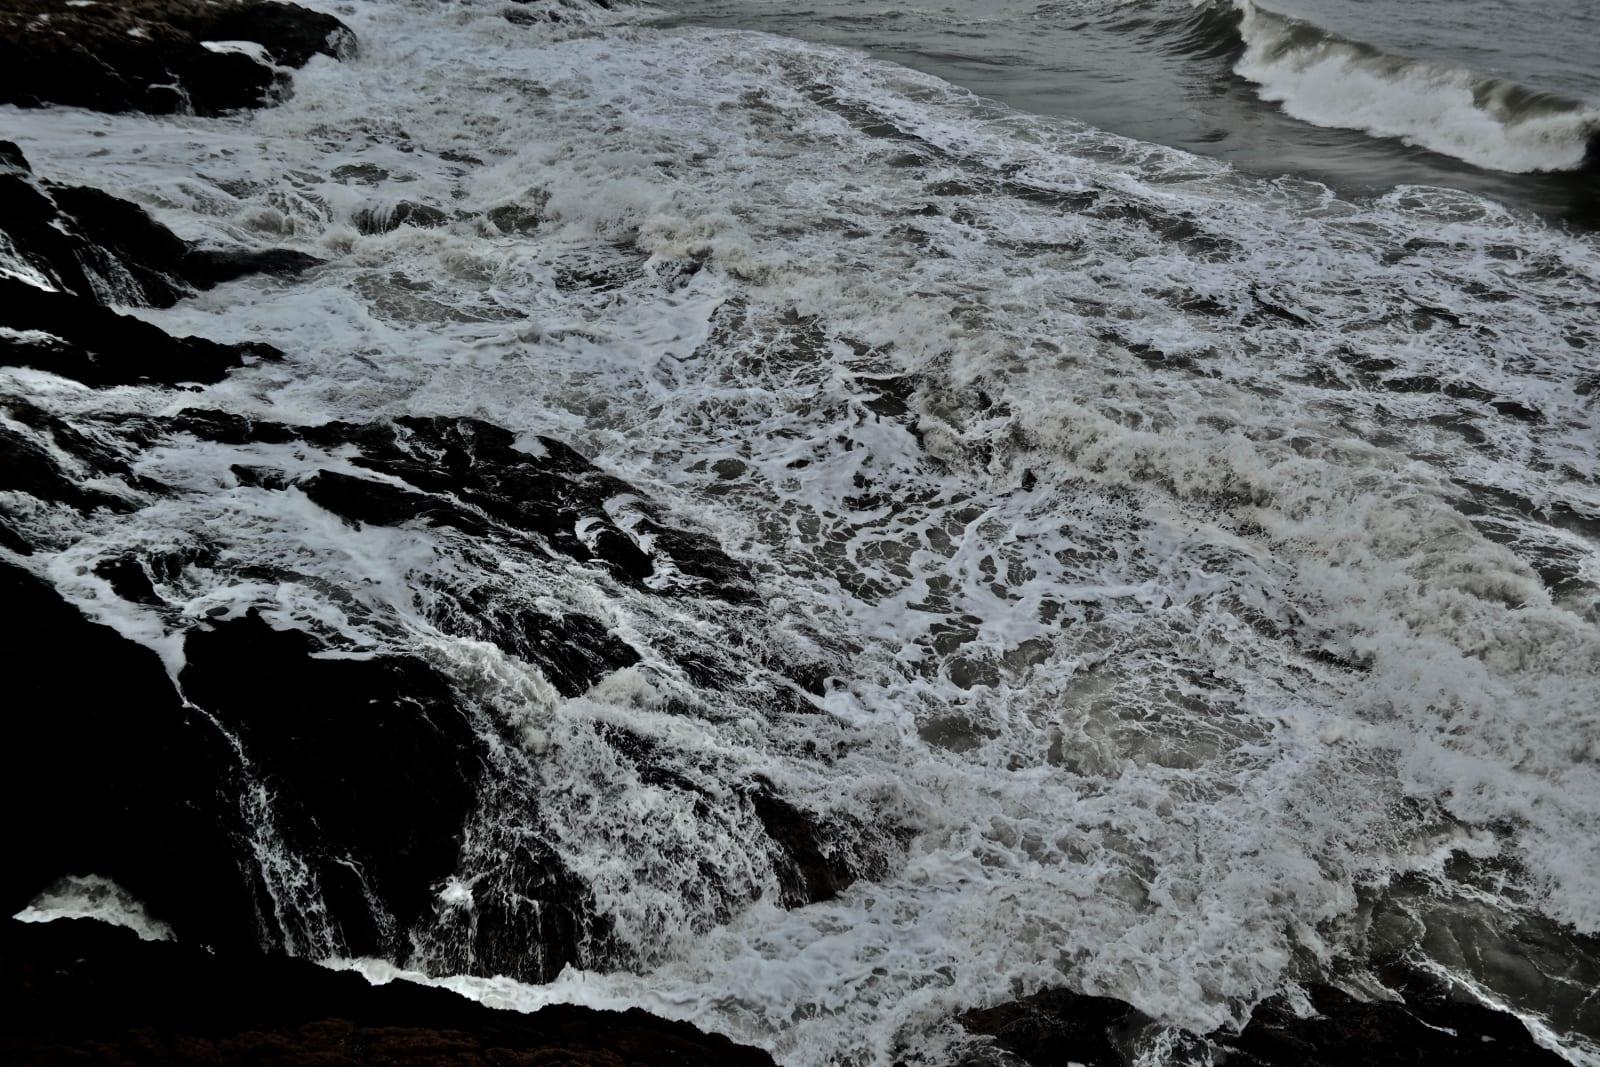 Latifah Iddriss Water tales and memory (inside earth) 42 x 27.67 cm 14.8 x 21 cm Digital print